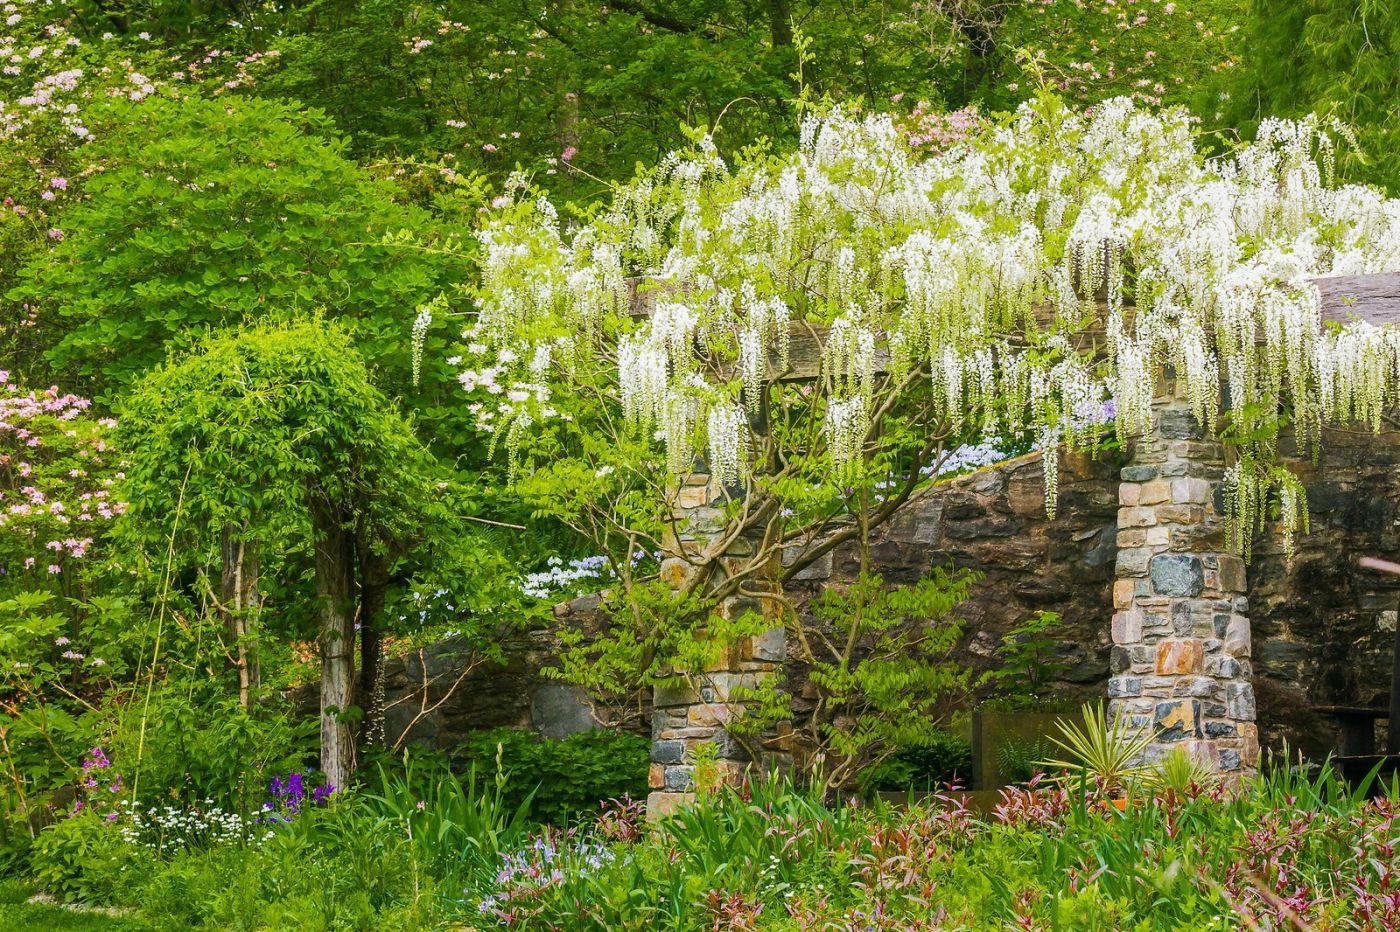 Chanticleer花园,那年盛开的紫藤花_图1-39